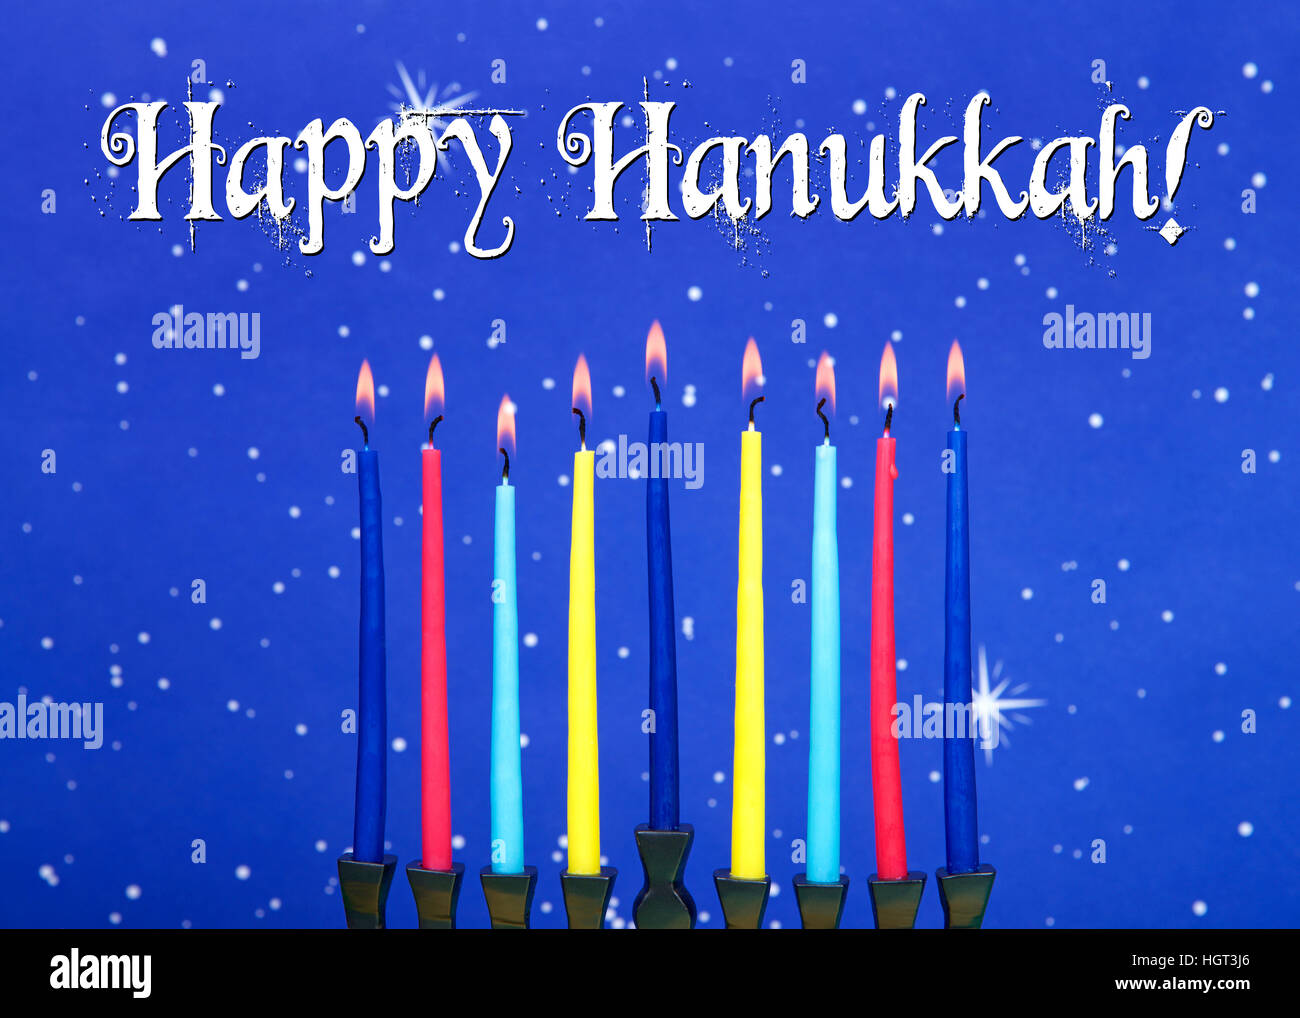 a nine-branched menorah (also called a Chanukiah or Hanukiah) burning candles to celebrate Hanukkah against a blue - Stock Image